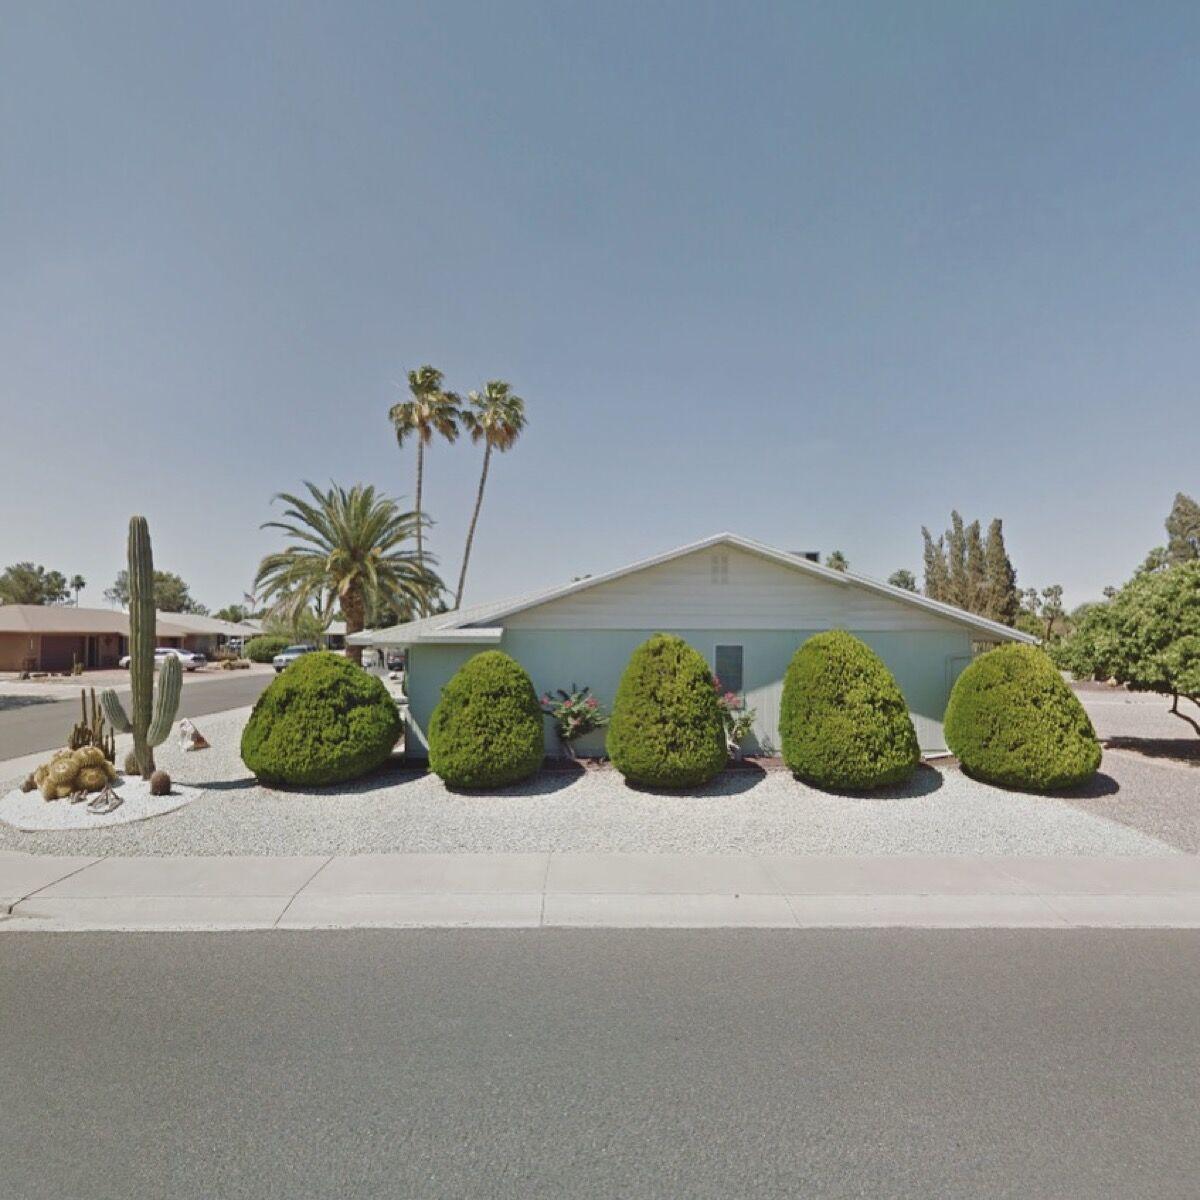 Sun City, Arizona, United States. Photograph by Jacqui Kenny via Google Street View.